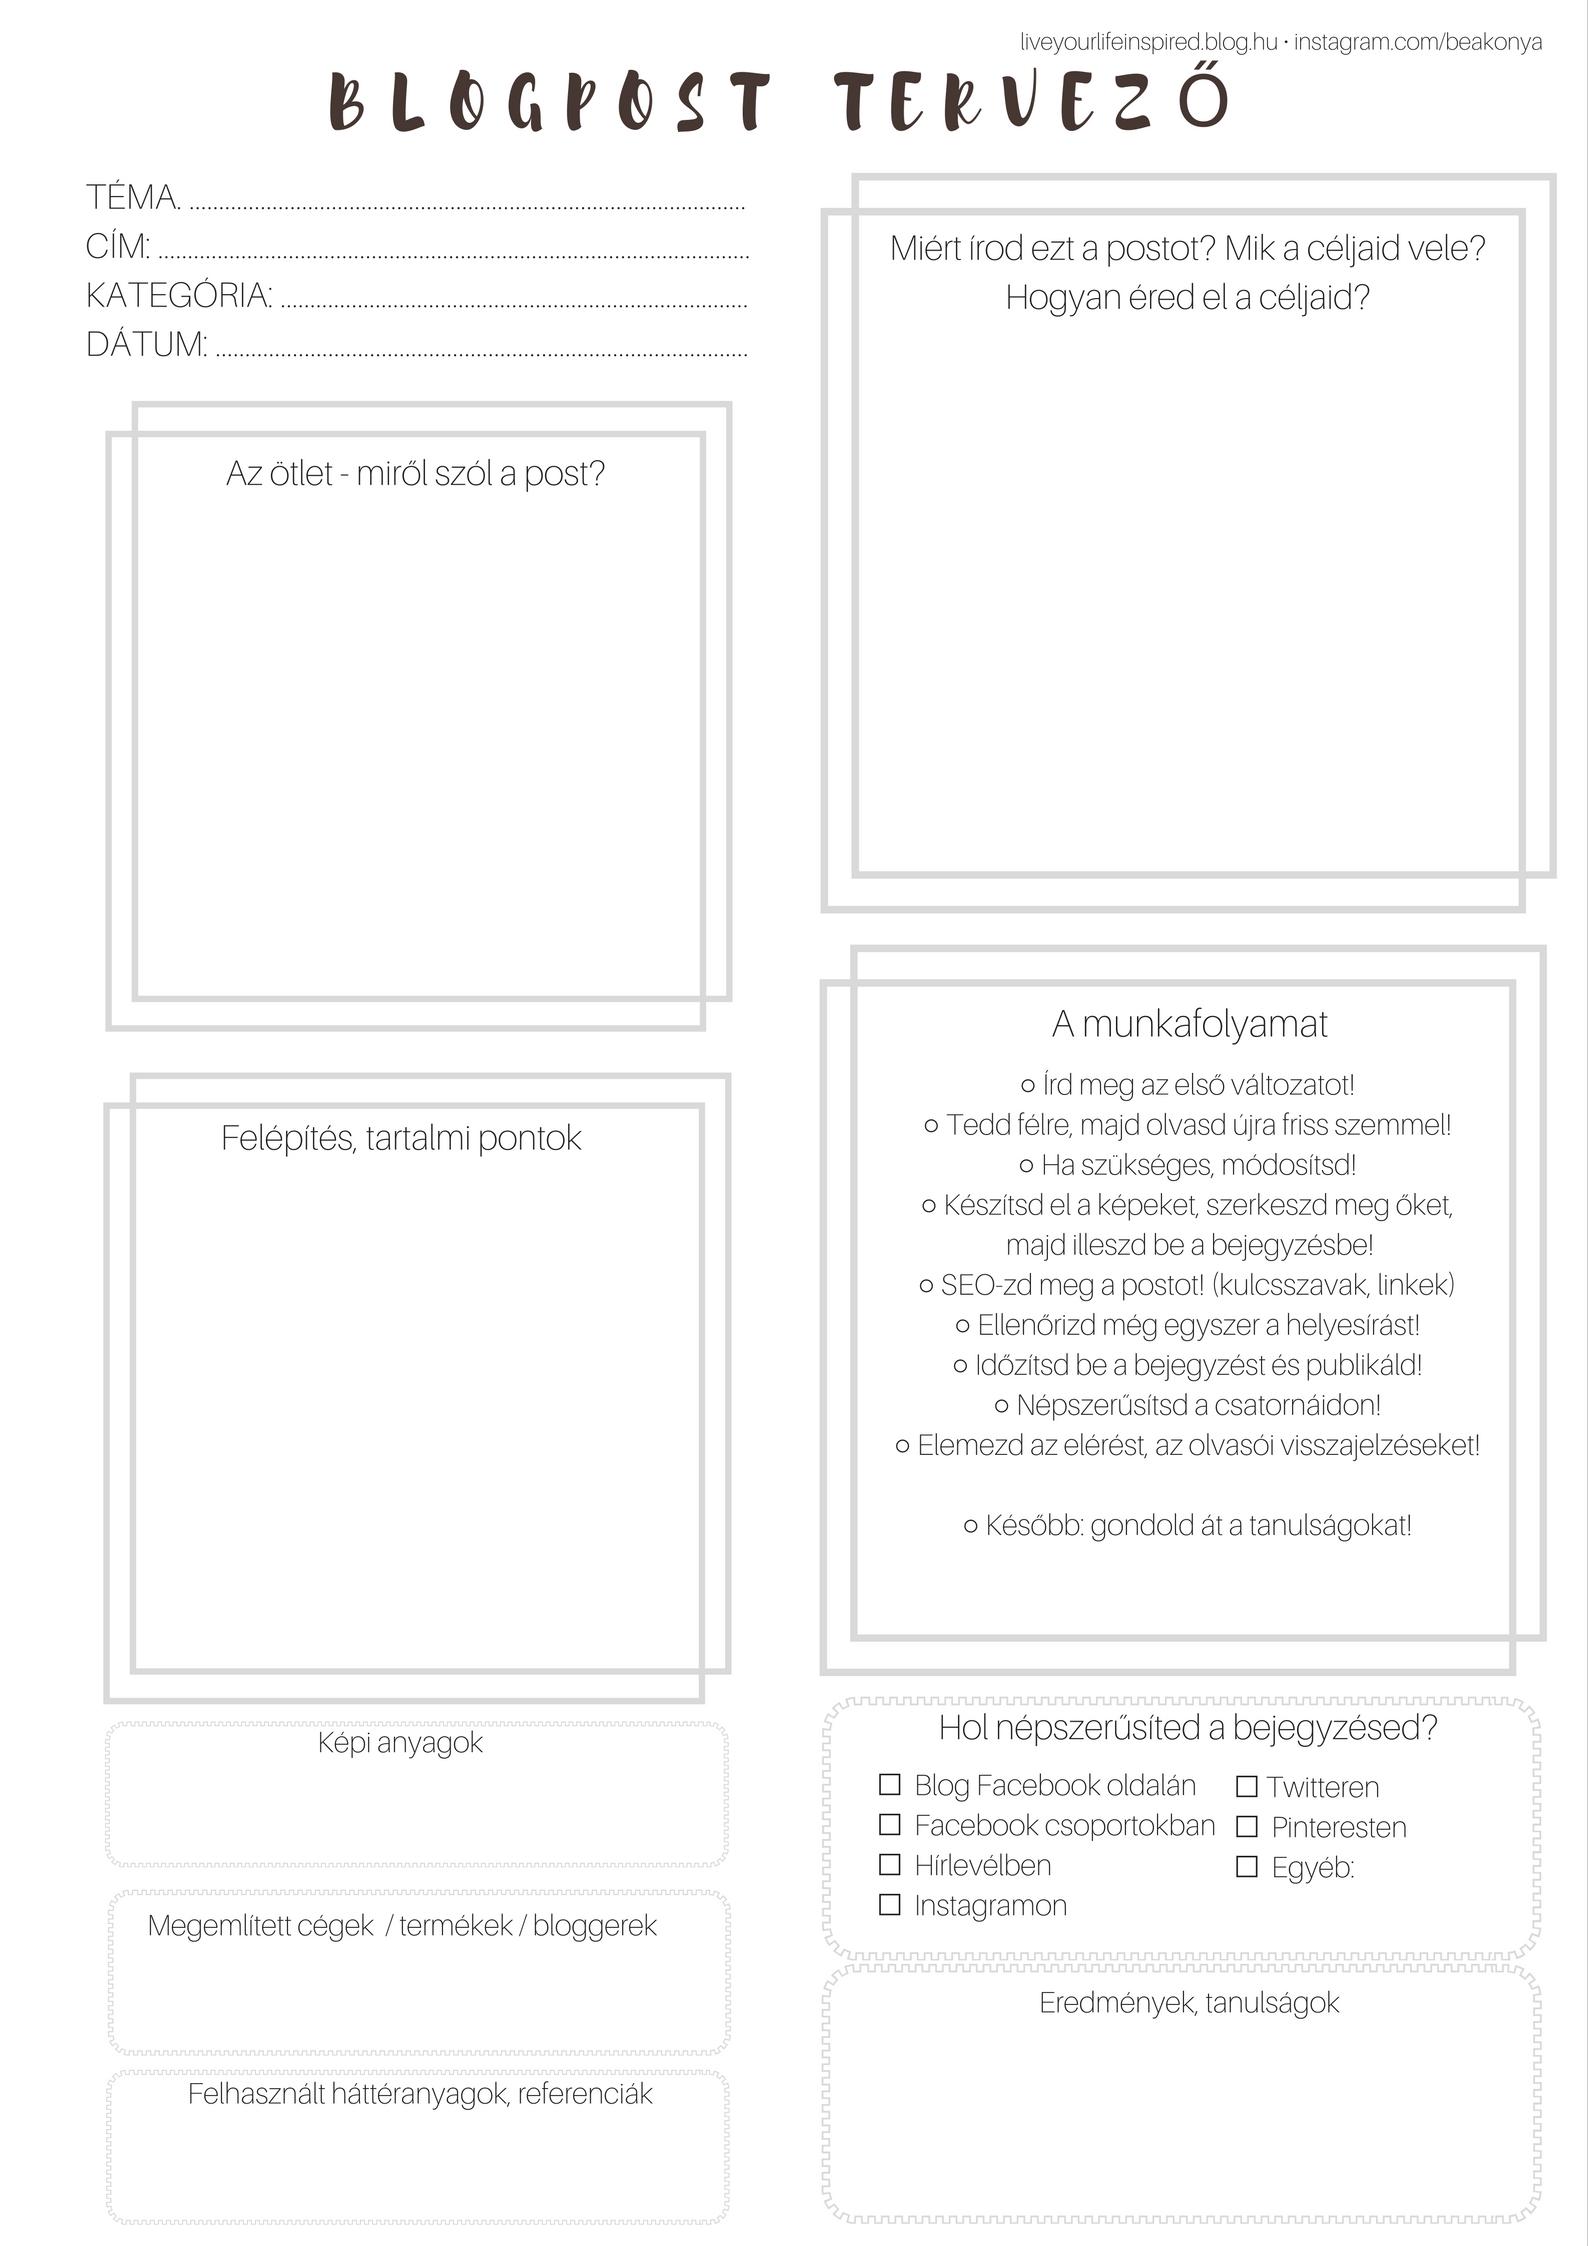 nyomtathato_blogpost_tervezo_es_checklist.jpg